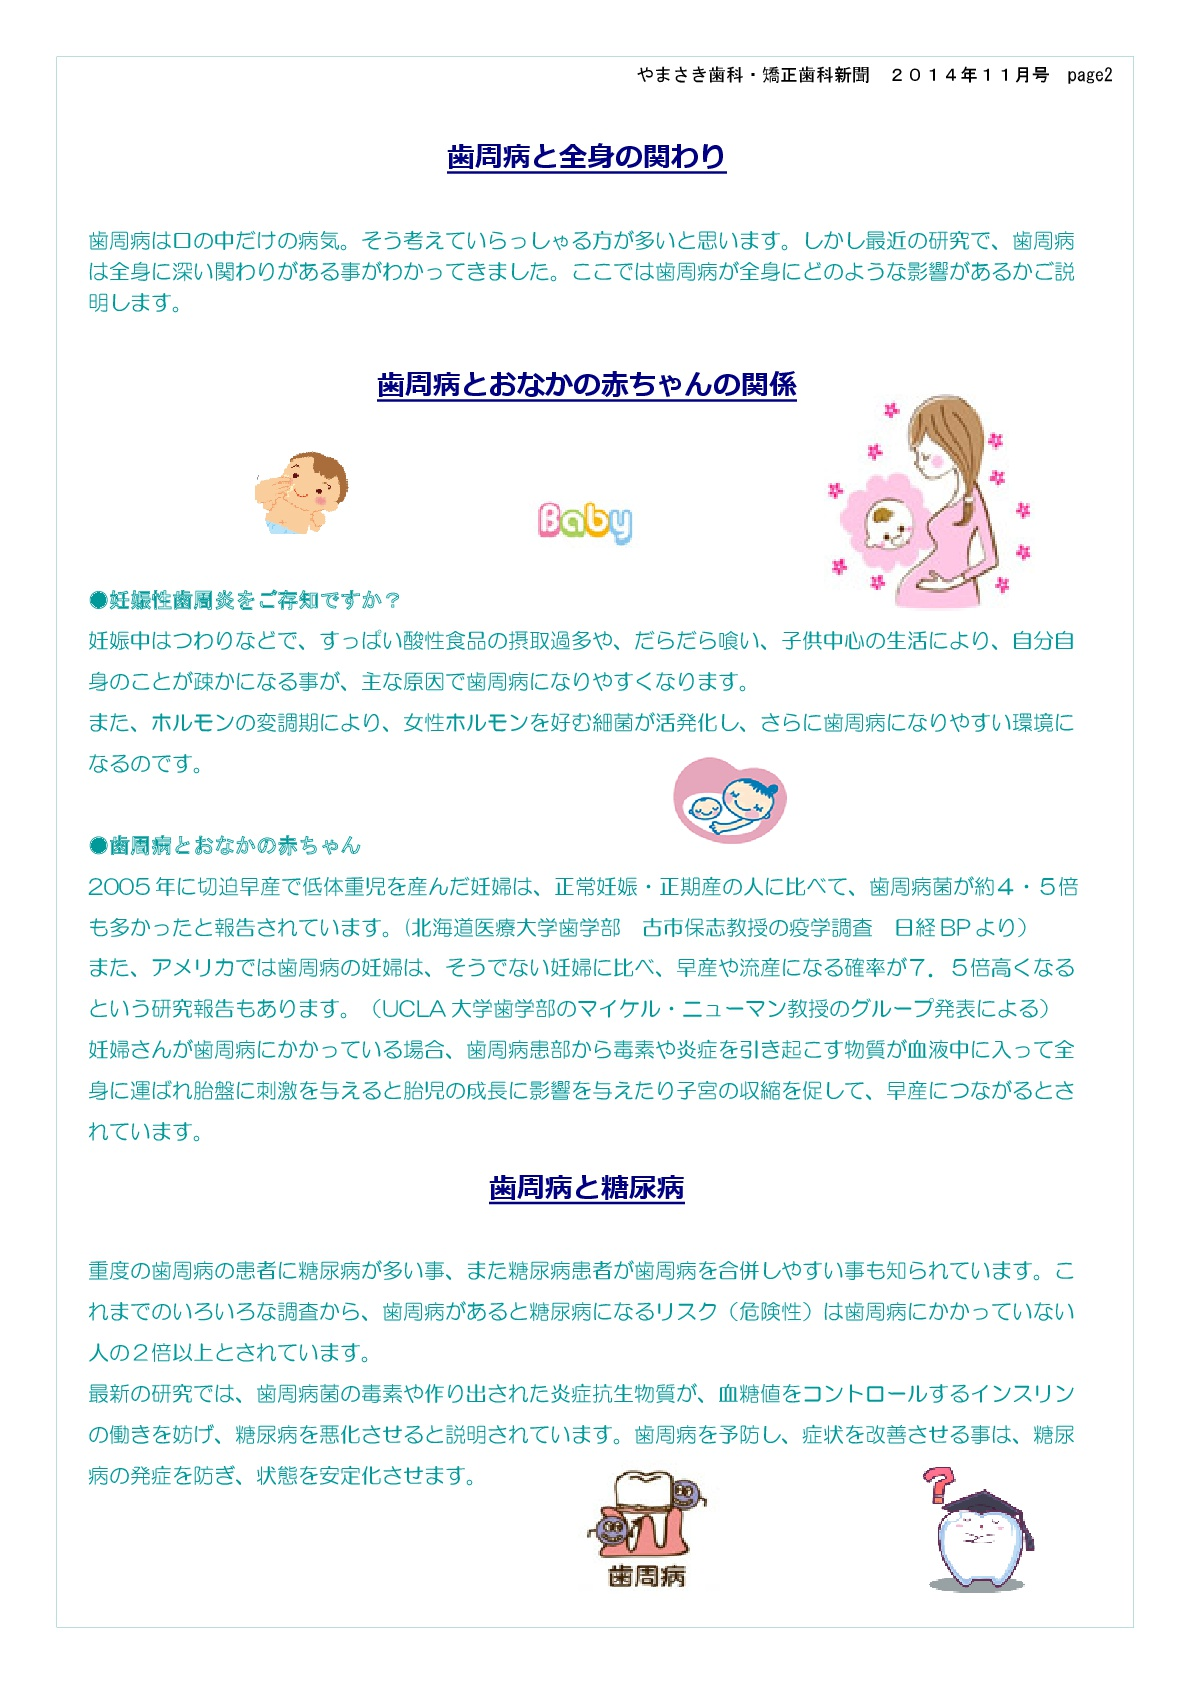 sinbun14-11-2-001